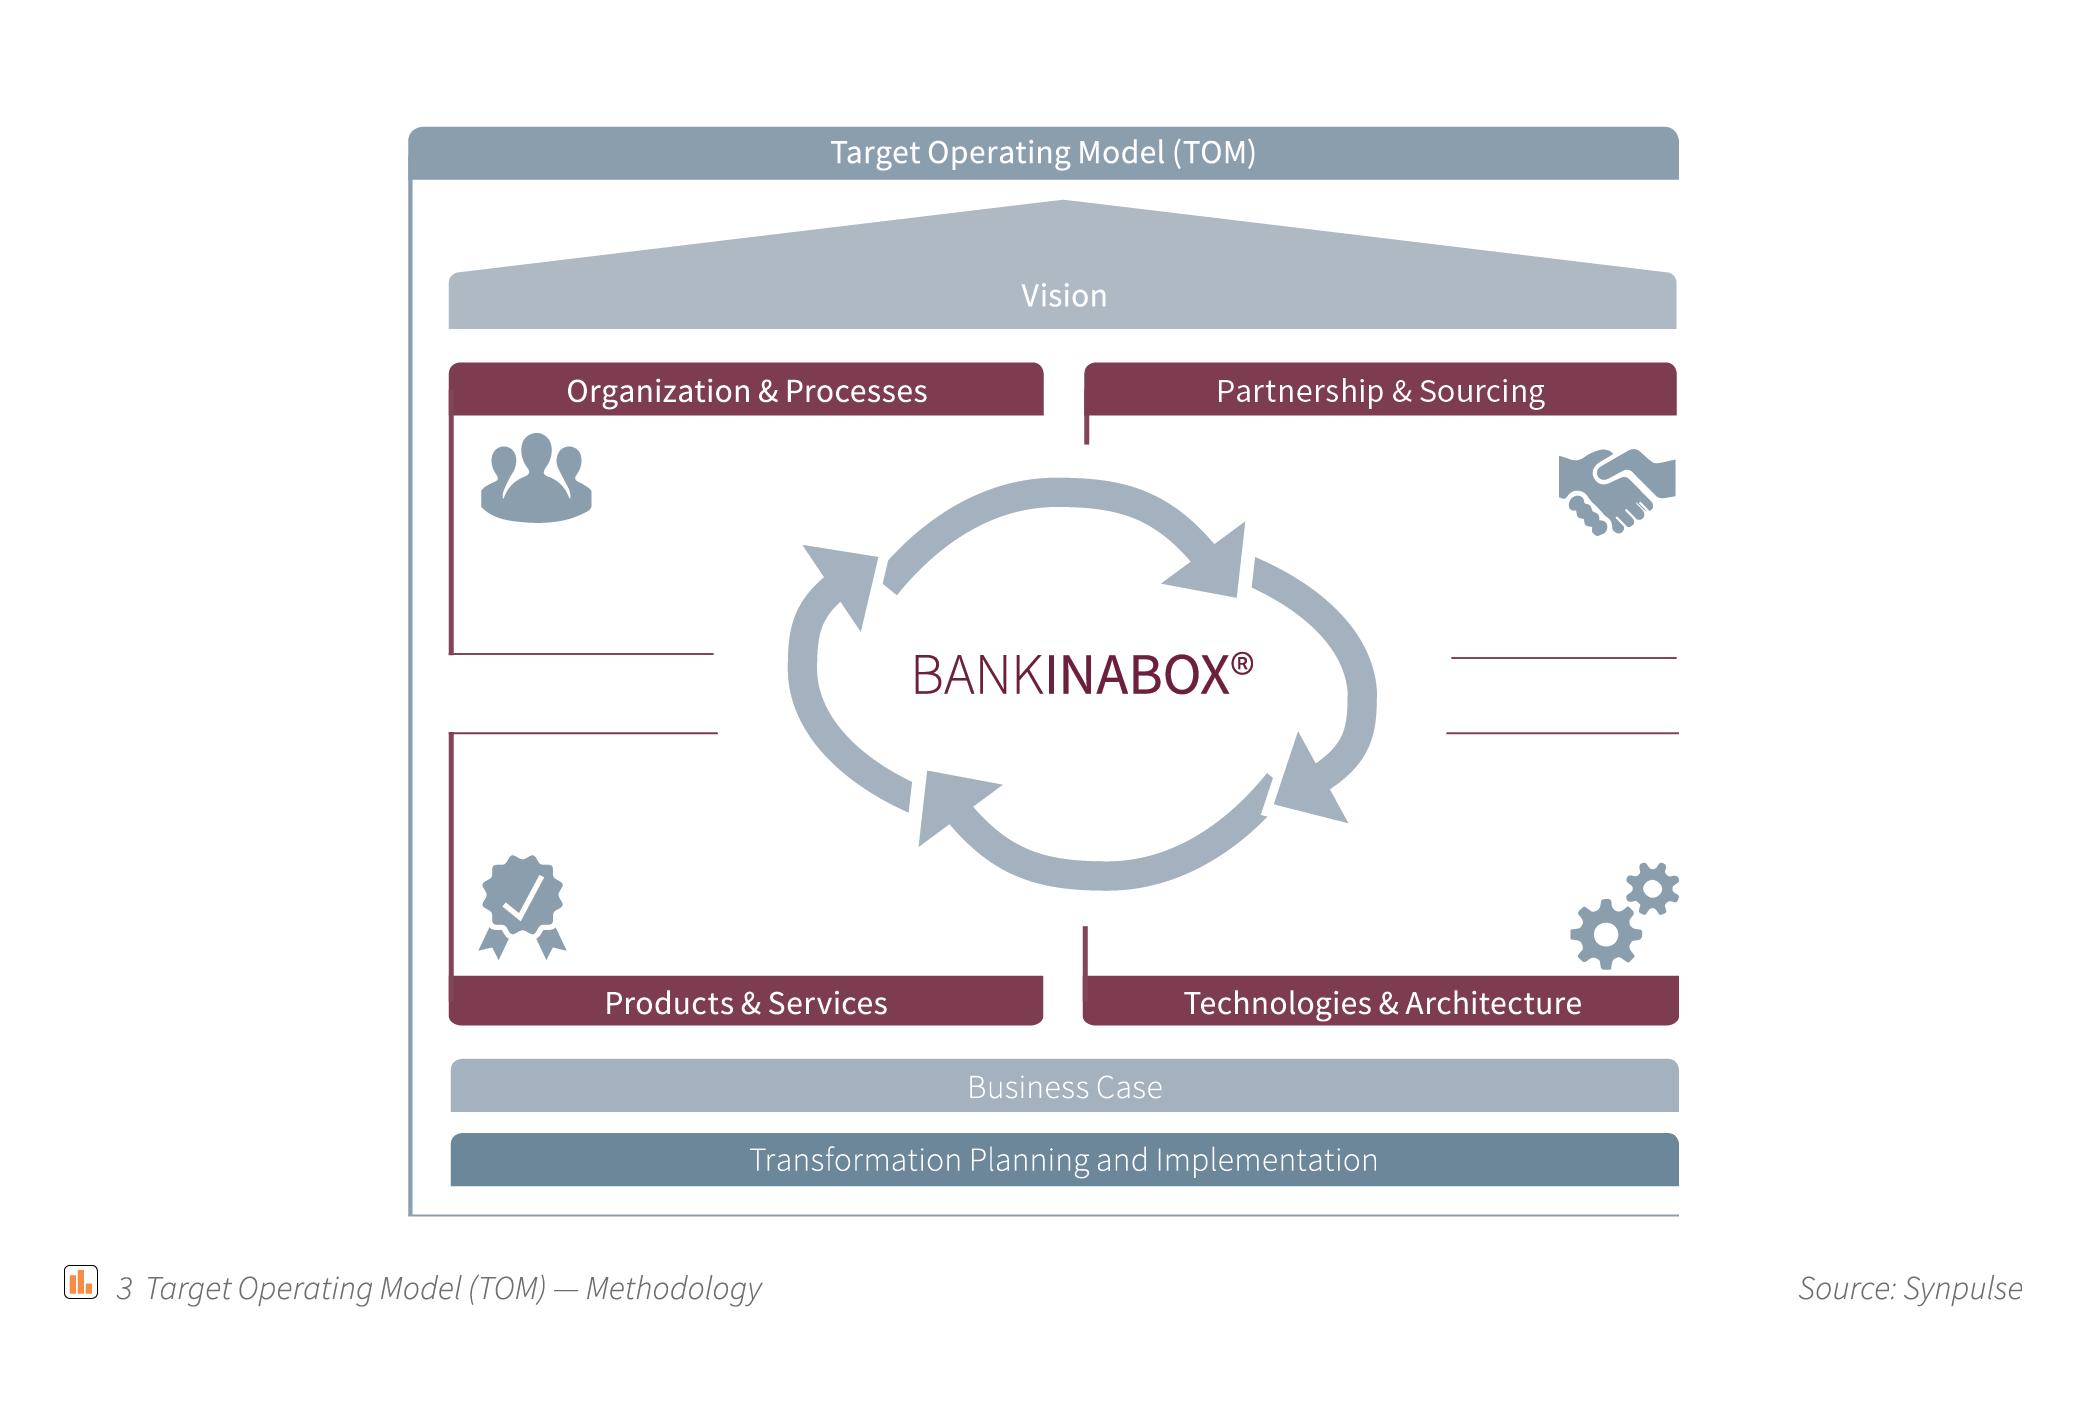 graphics_forpriyanka_target-operating-model-tom-methodology